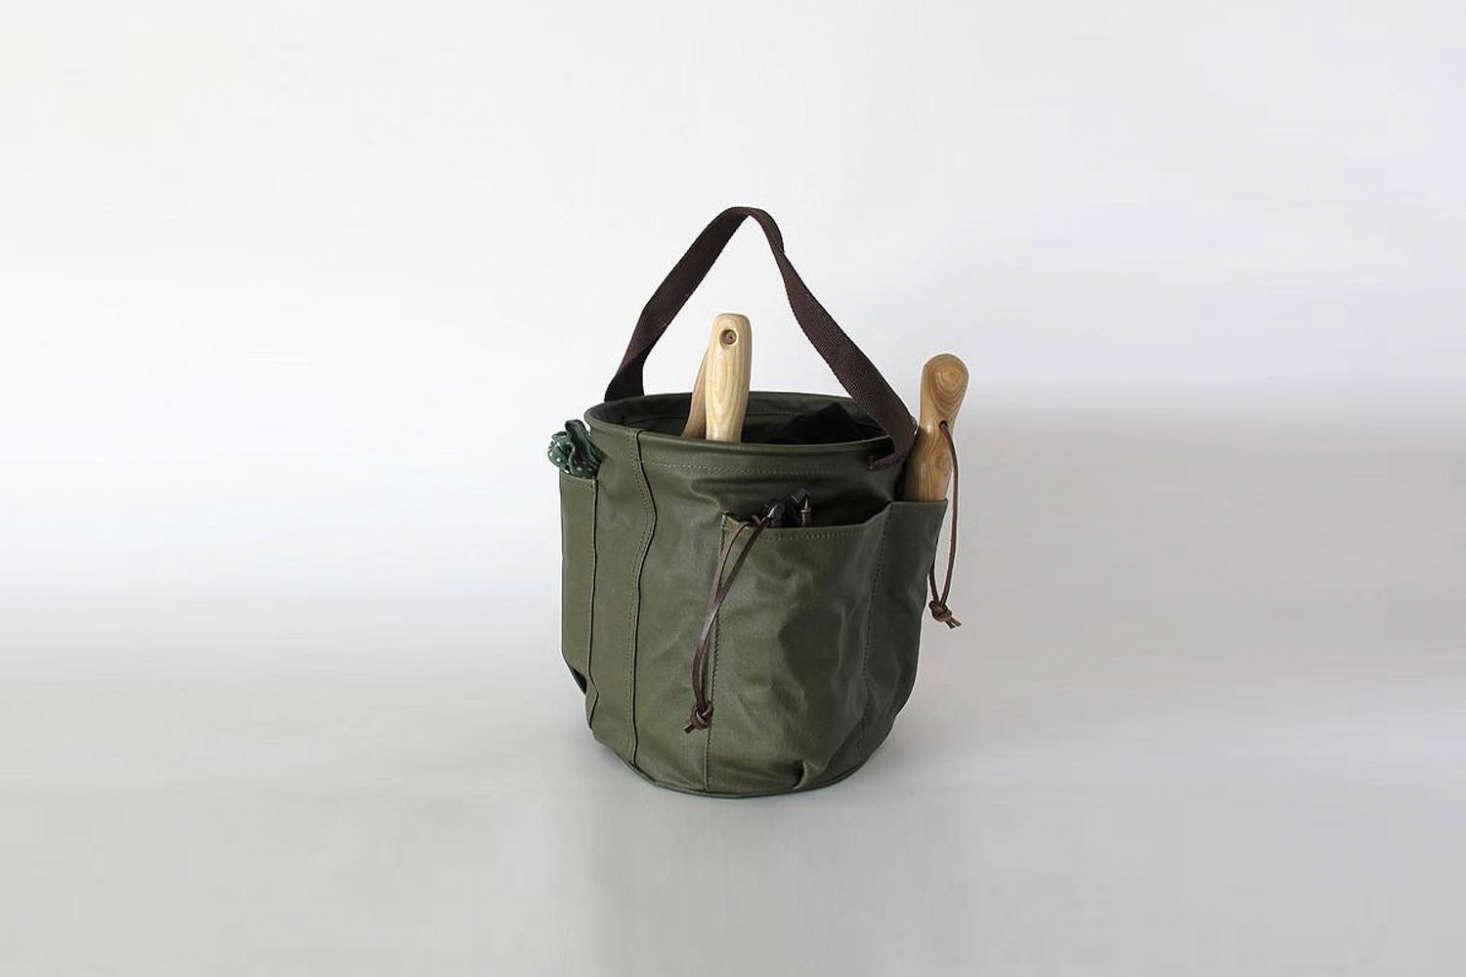 garden bag. A Collaboration Between New Zealand Home Goods Shop Everyday Needs And Bag Designers Deadly Ponies, Garden